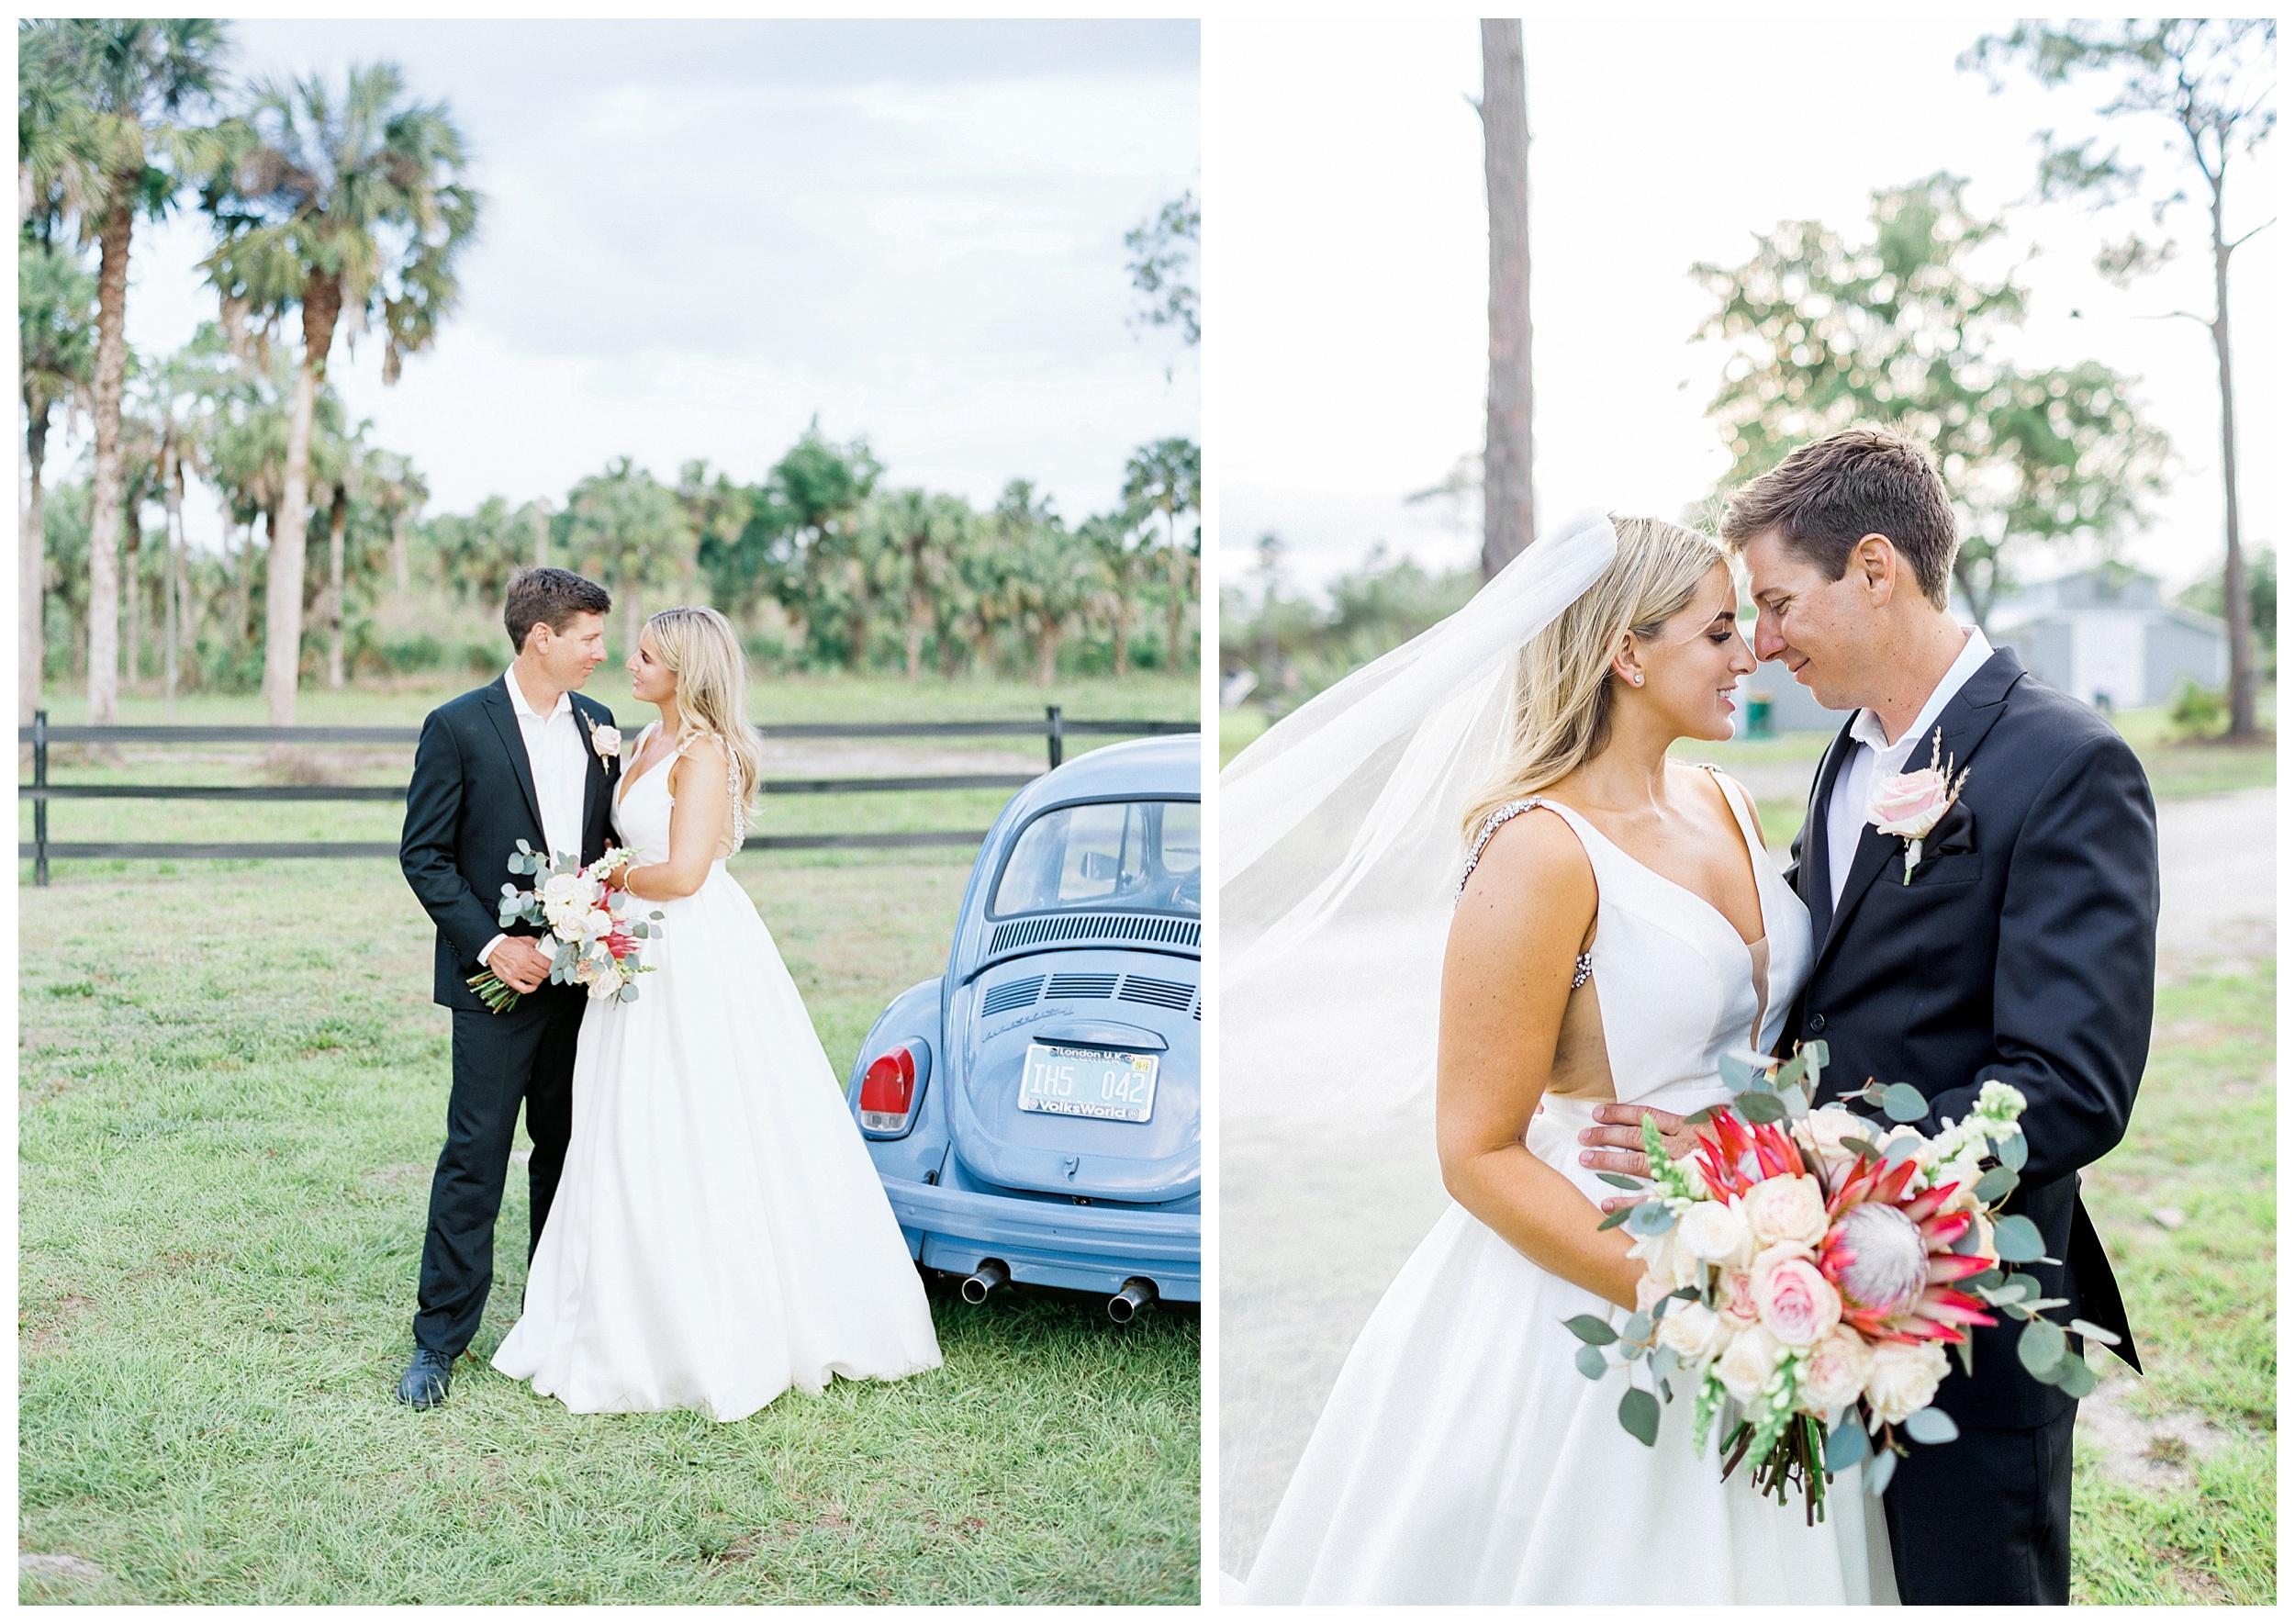 South Florida Wedding Photographer Kir Tuben_0099.jpg